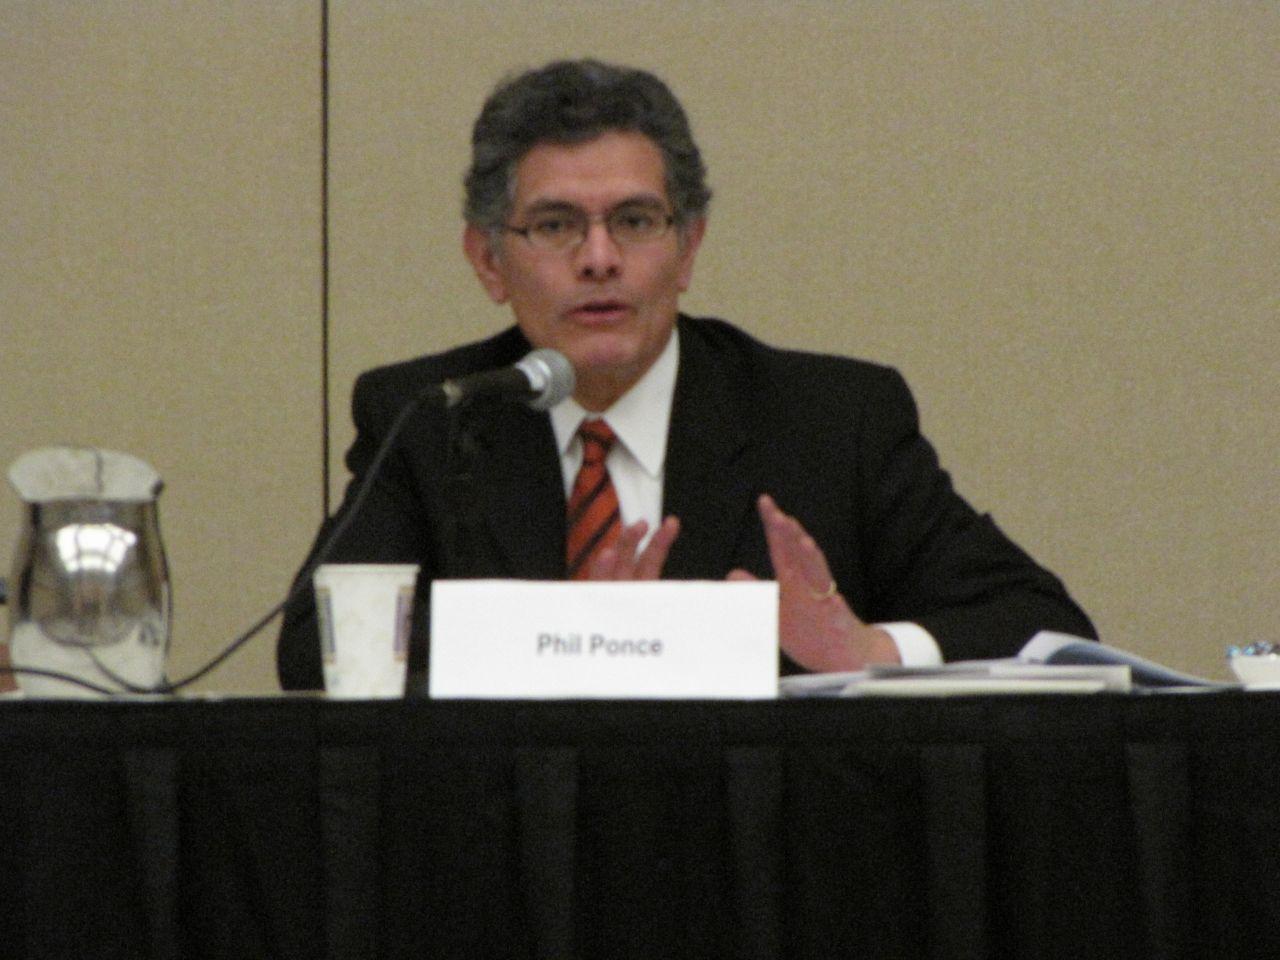 Moderator Phil Ponce